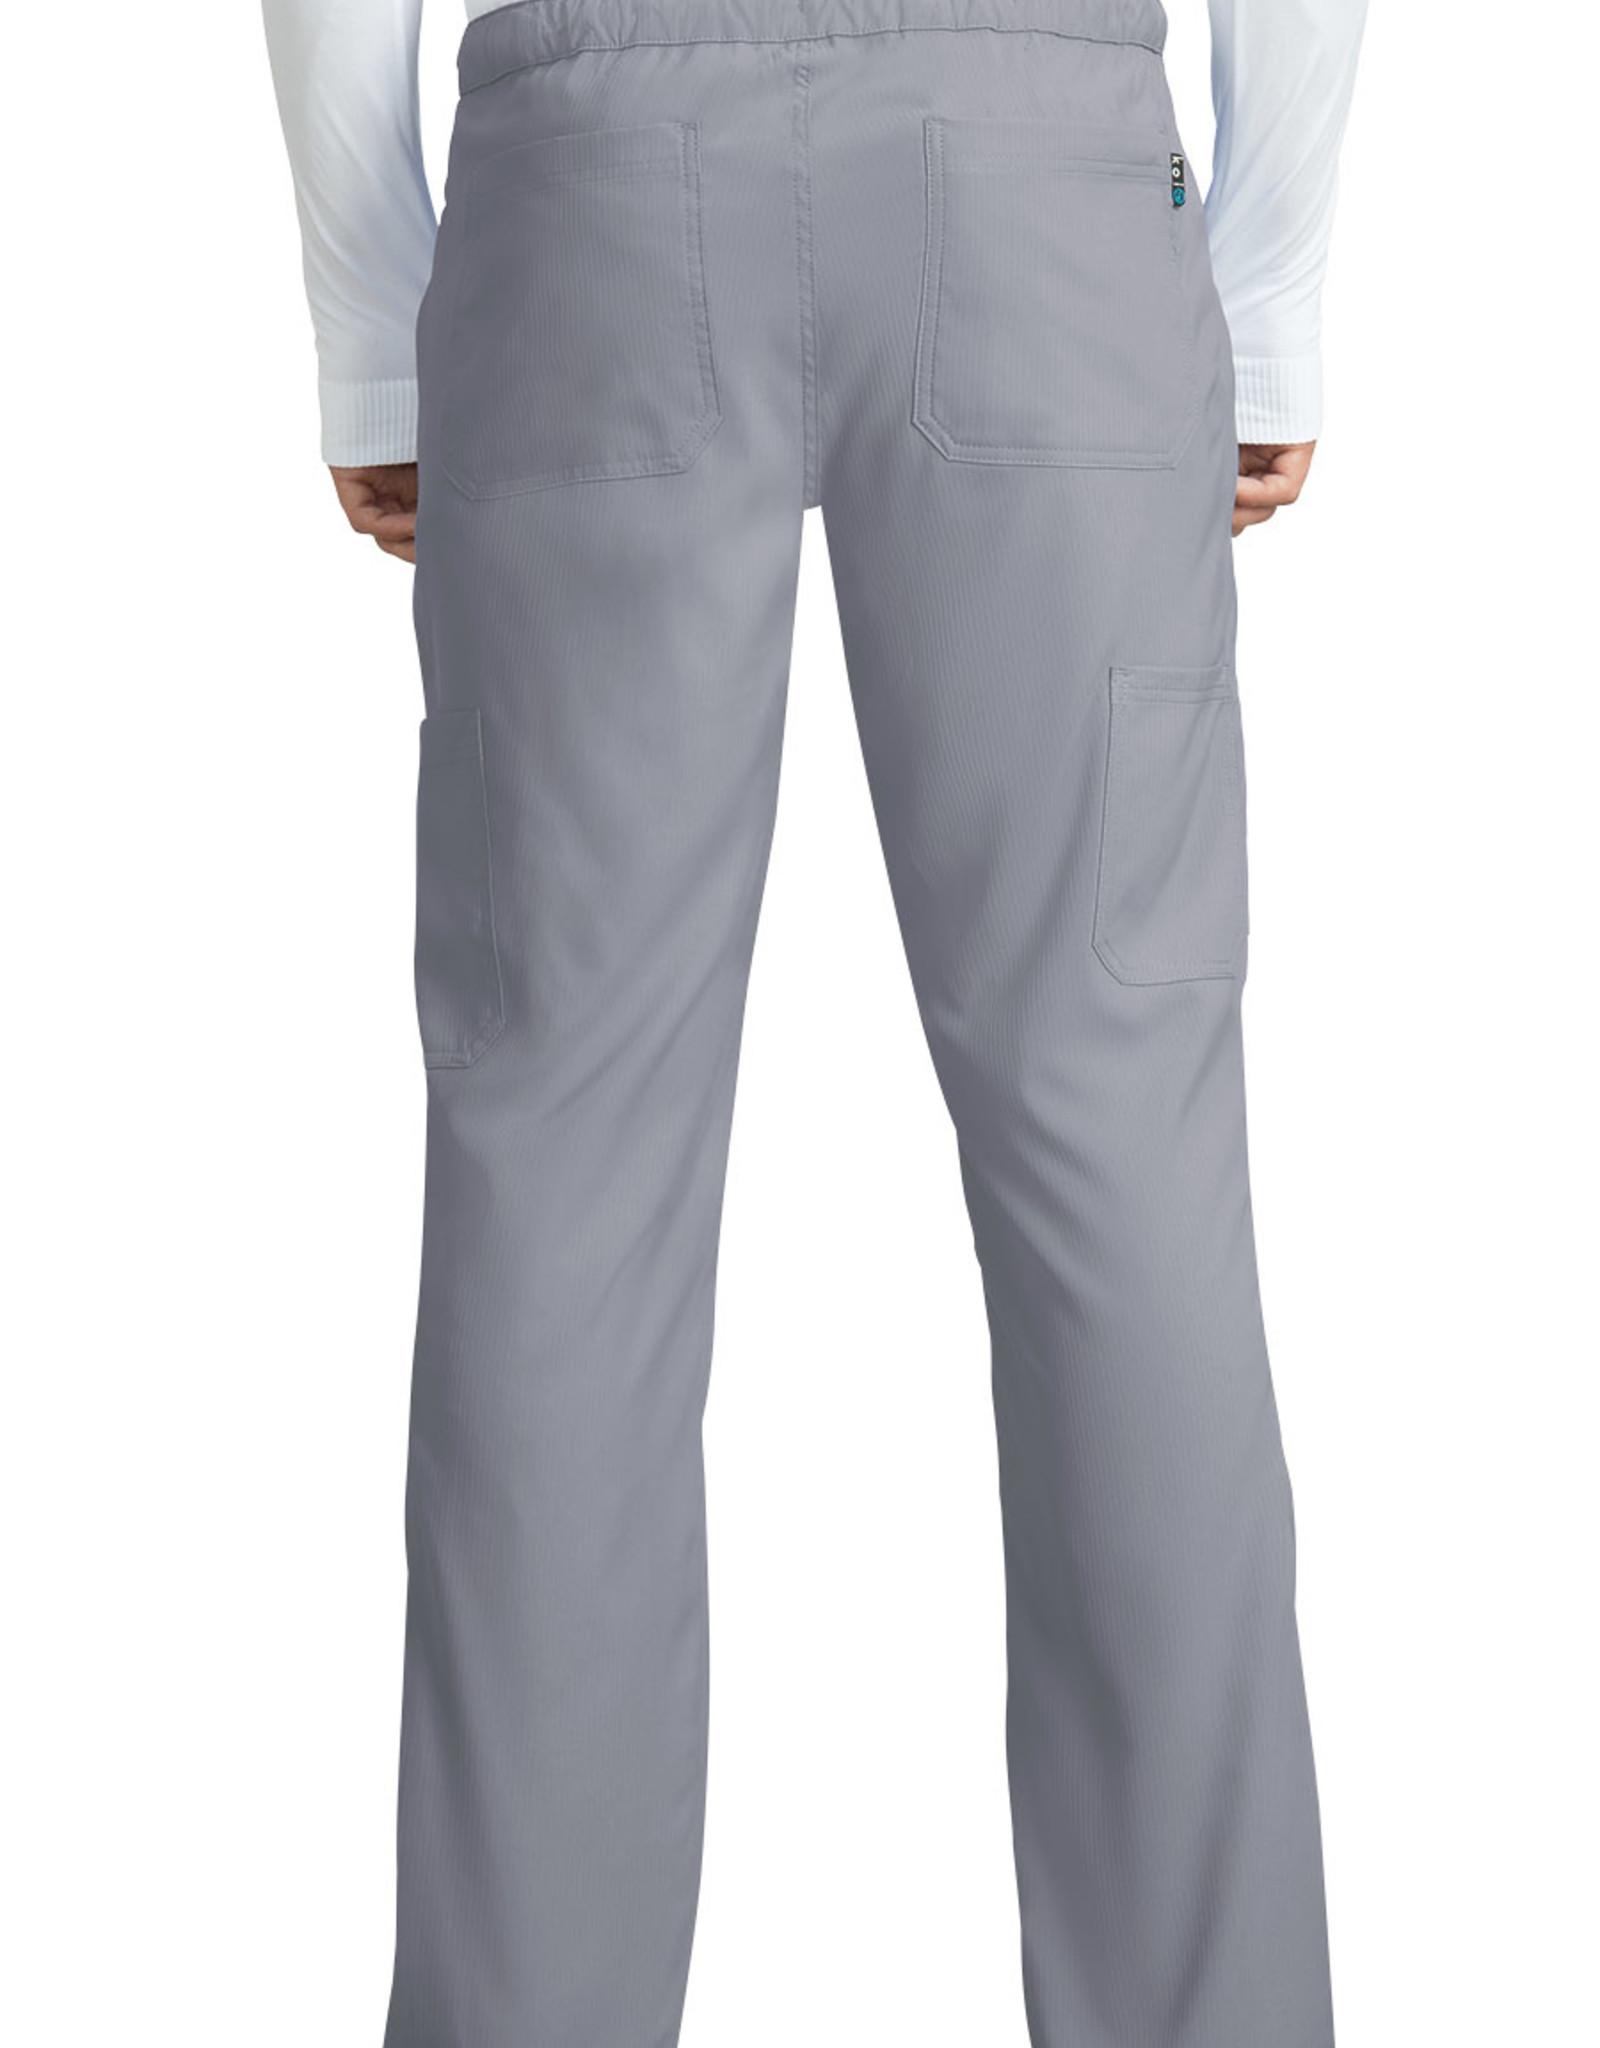 Koi 606 Men's Pants Discovery Platinum Grey